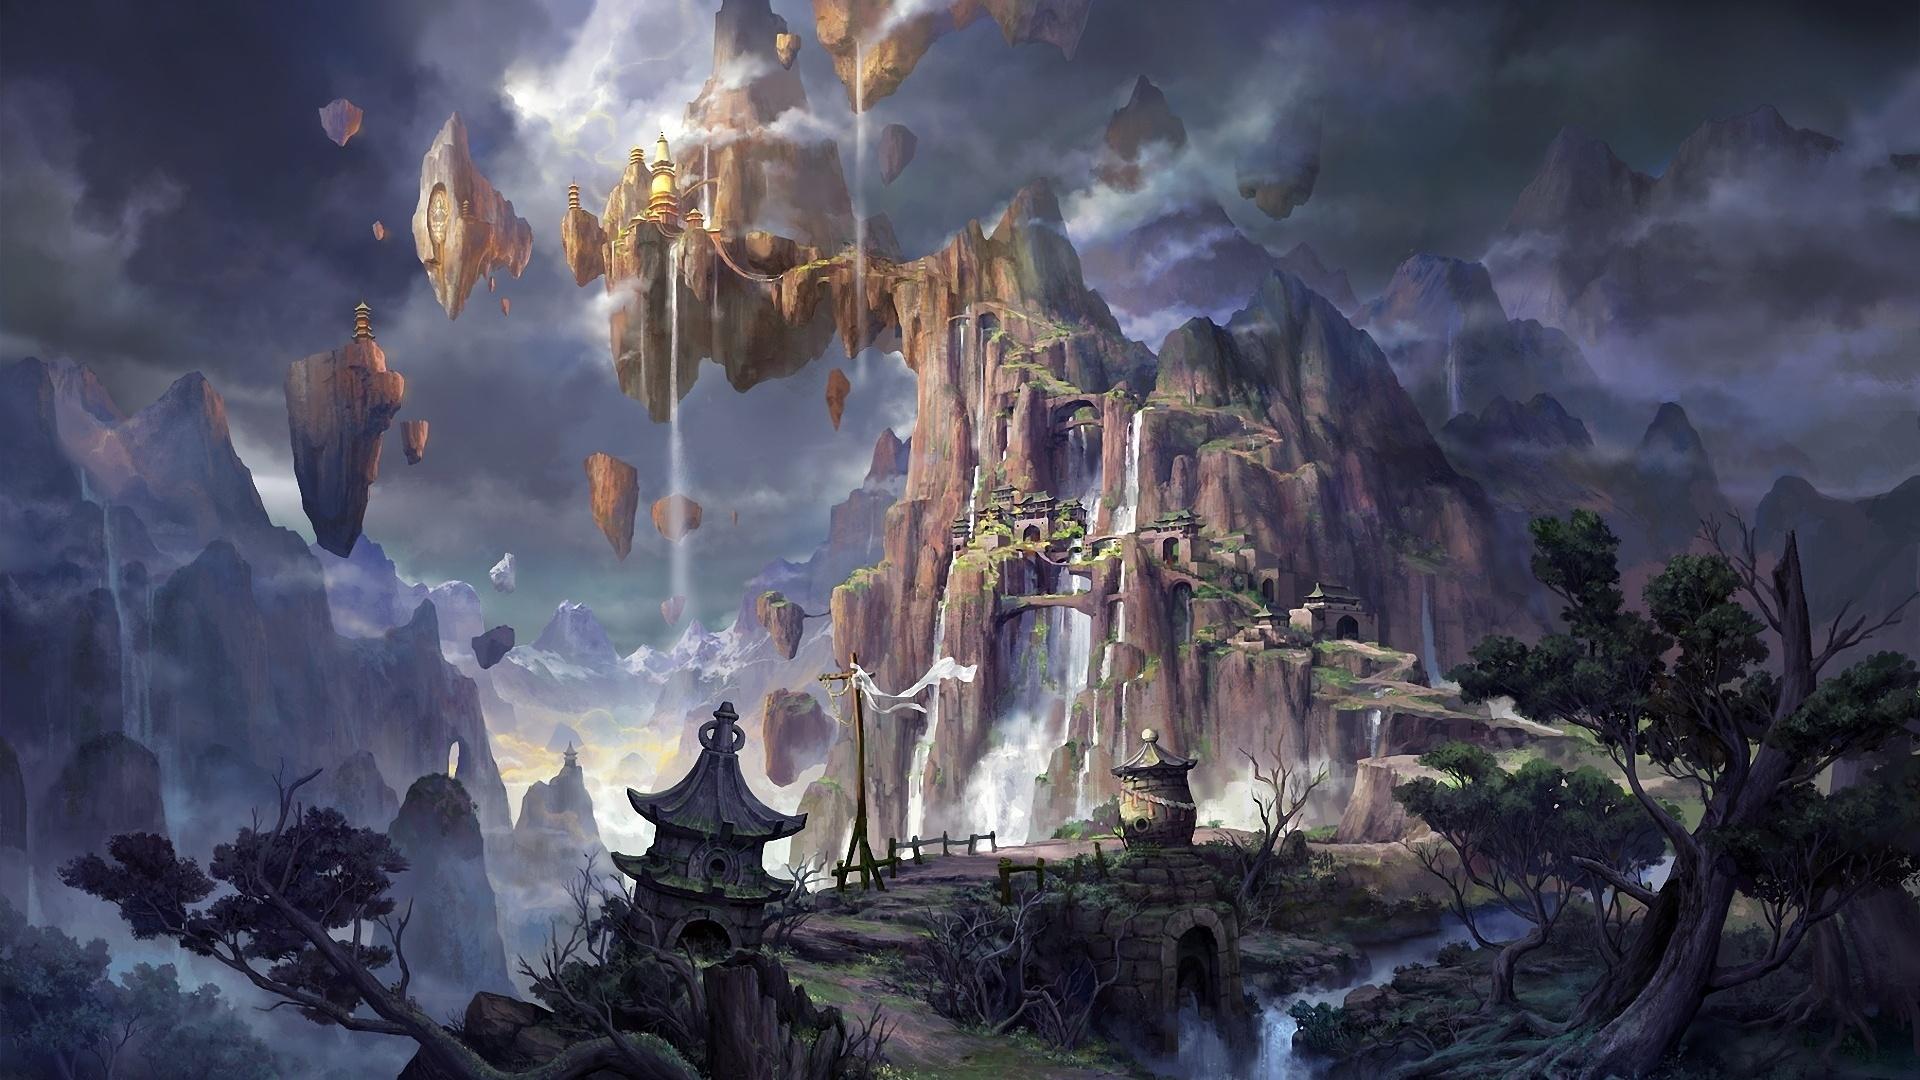 Fantasy Landsсape wallpaper photo